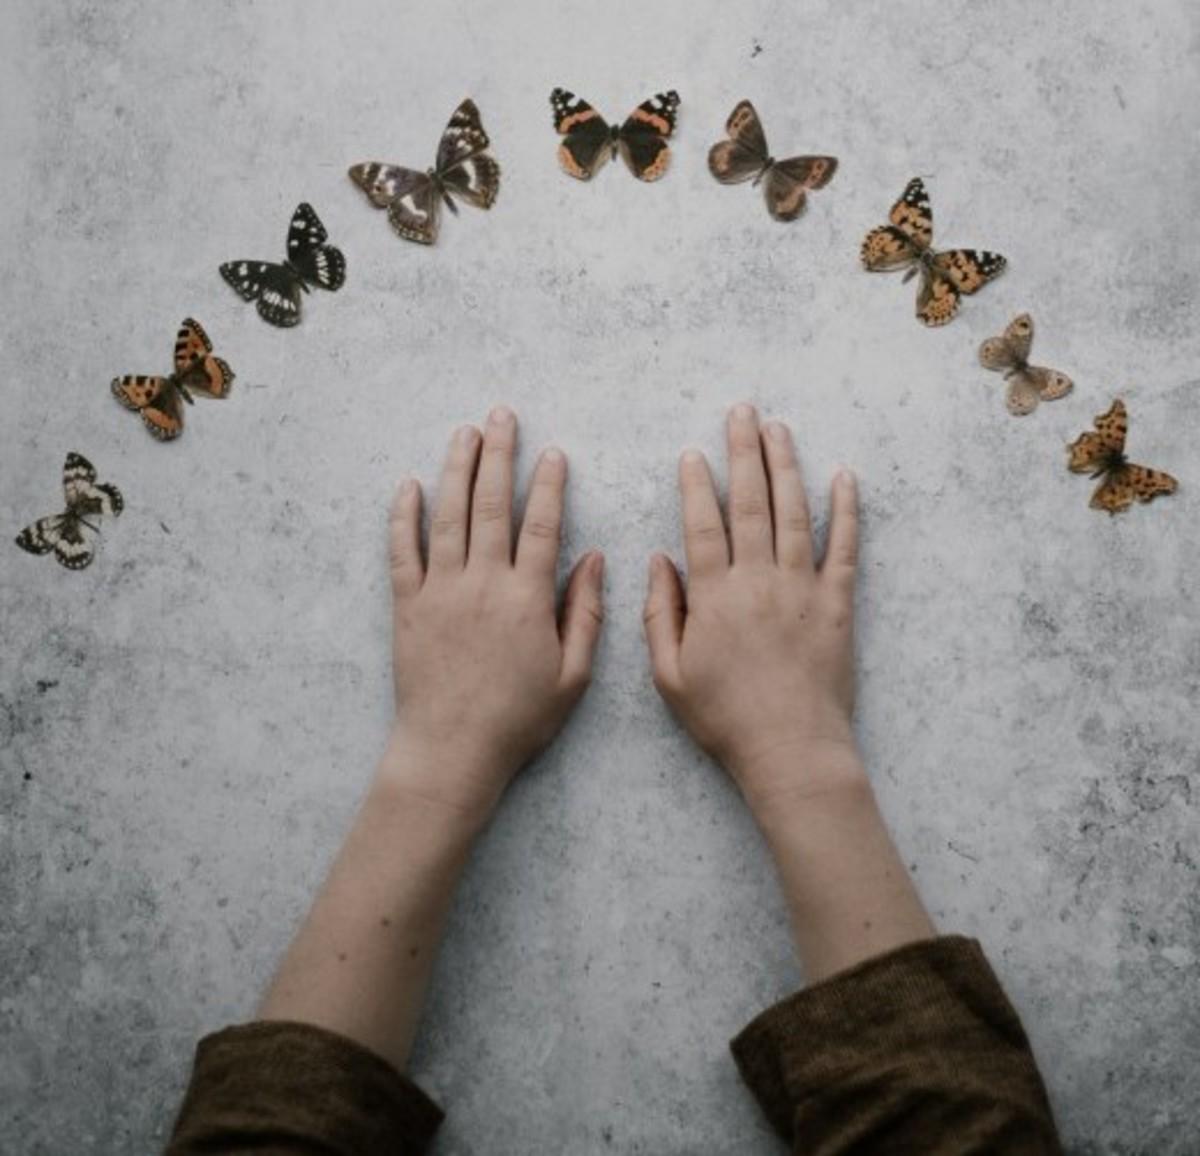 10-ways-to-change-your-mindset